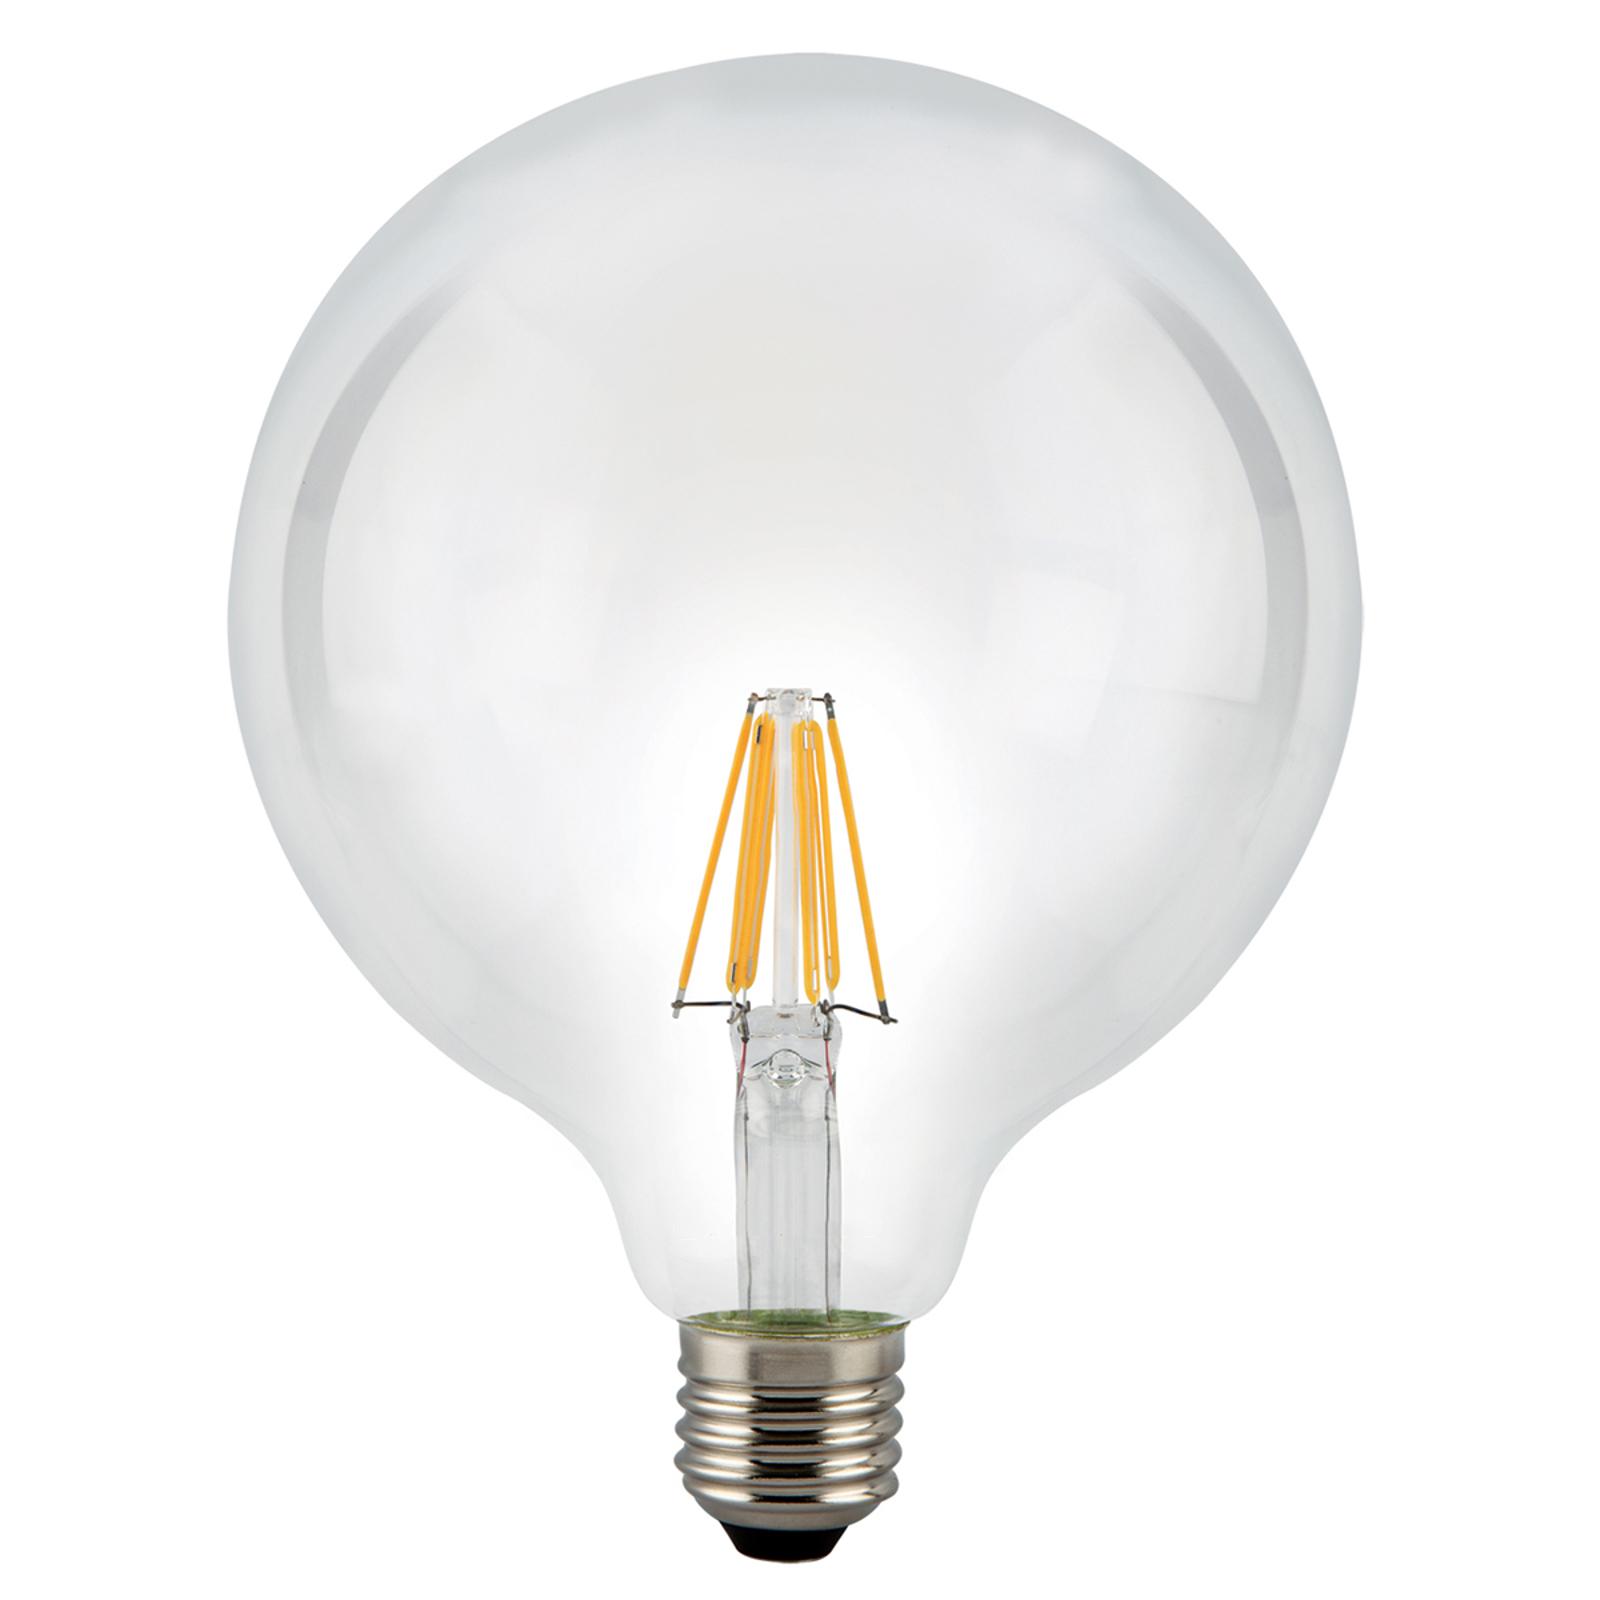 Ampoule globe LED E27 7,5W 827, transparent